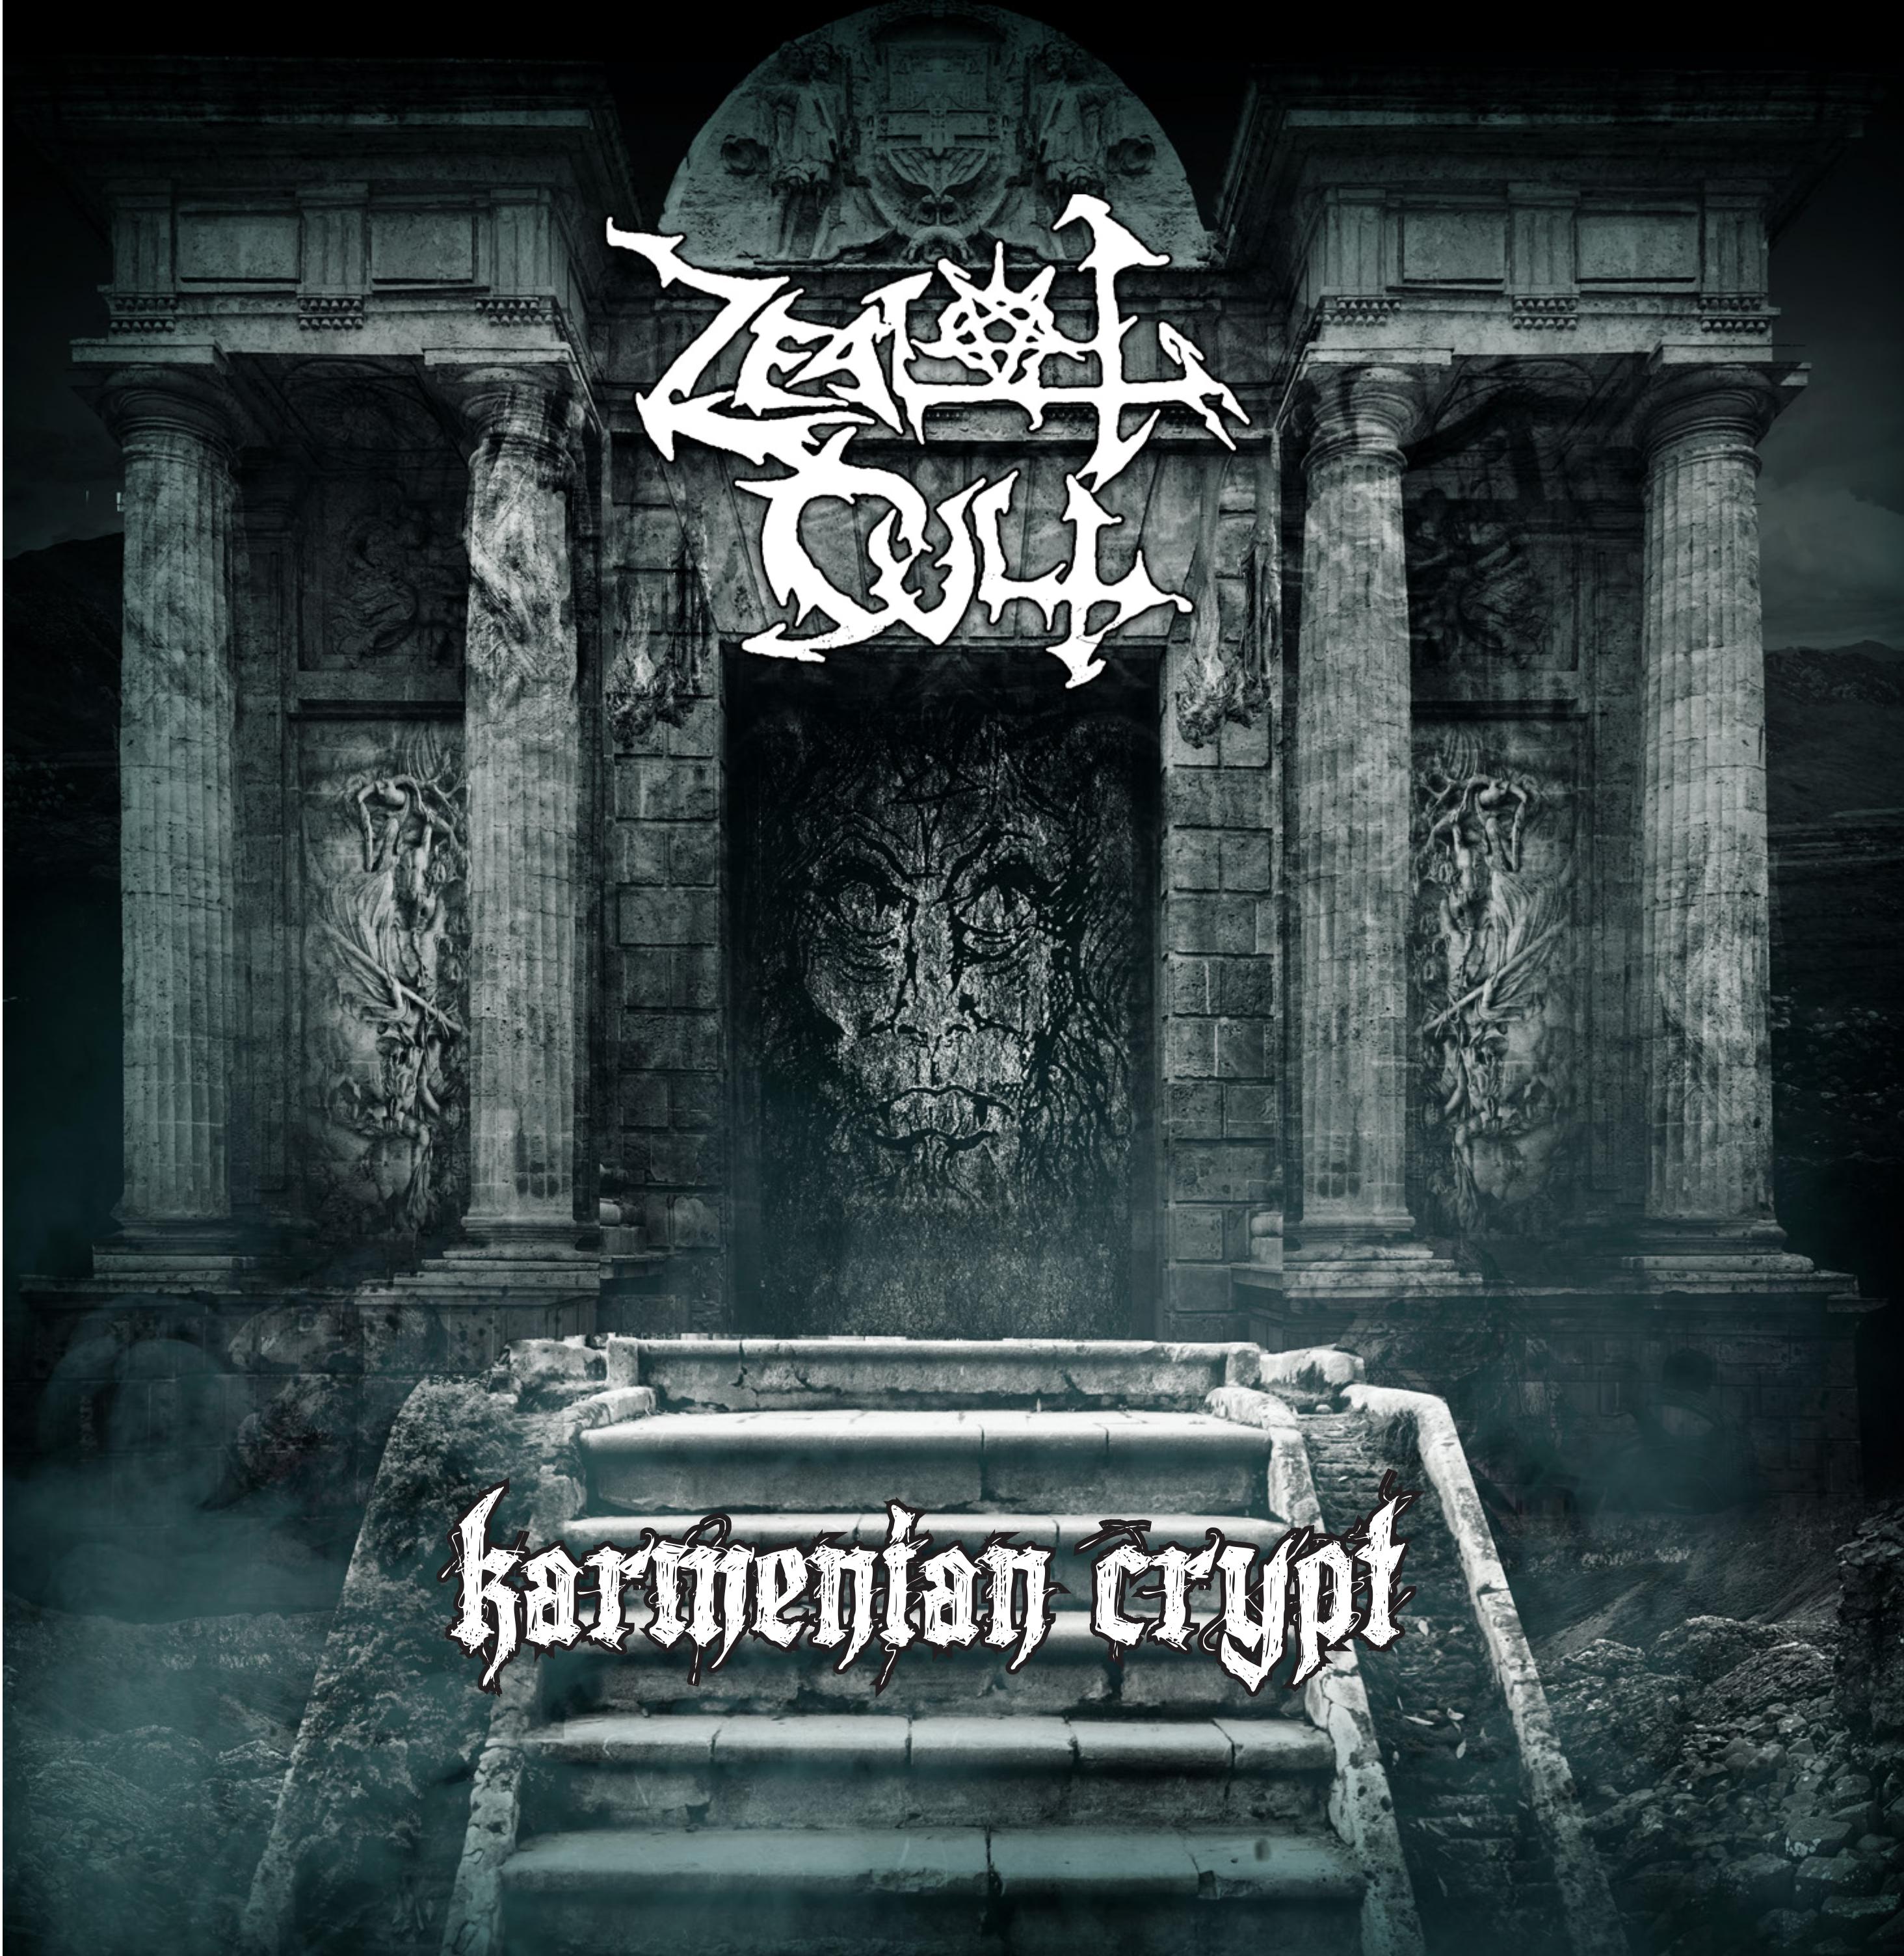 Zealot_Cult_-_Karmenian_Crypt_2016_01front